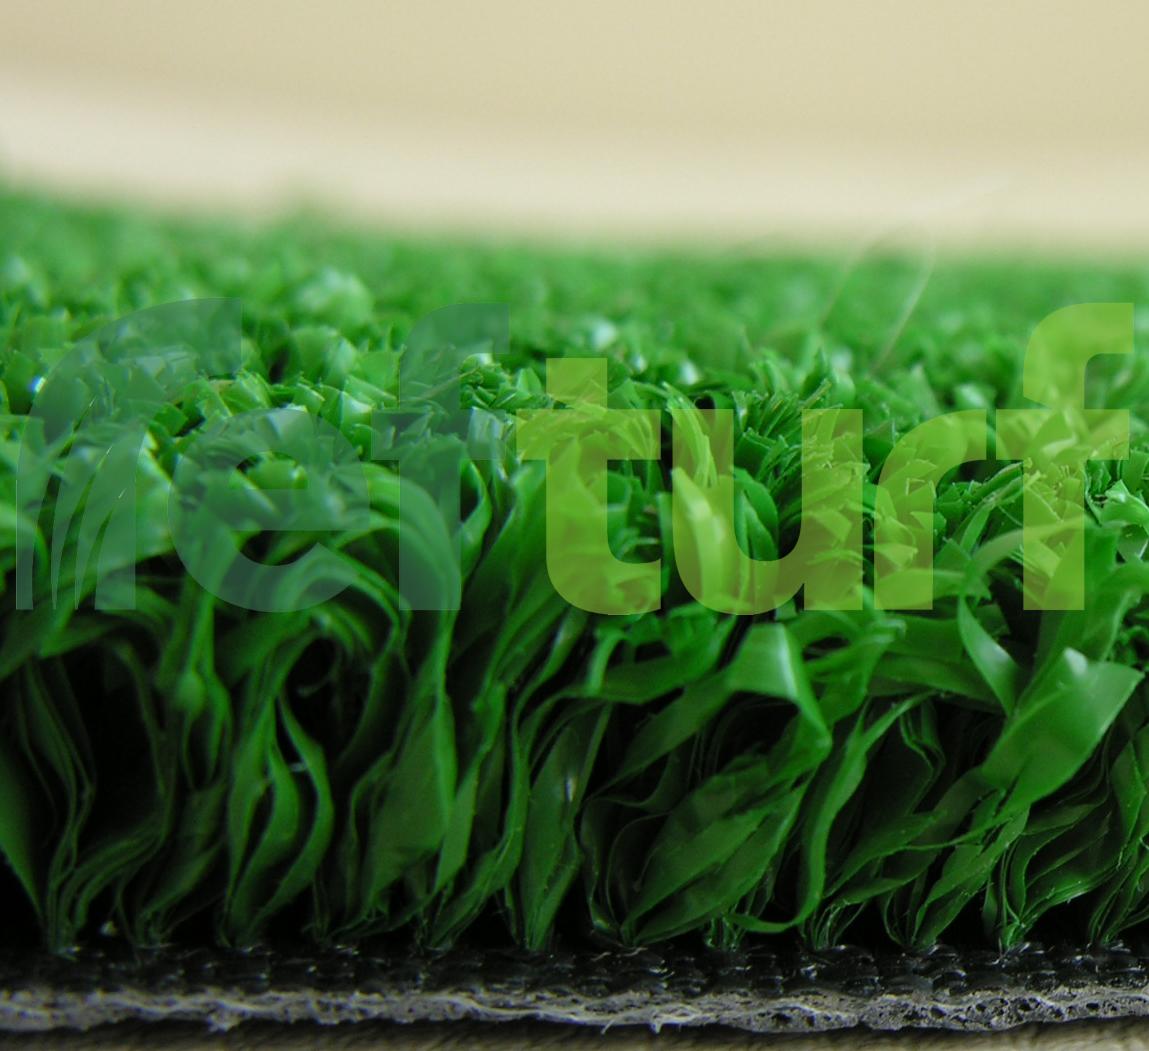 sentetik çim halı, sentetik çim, suni çim, yapay çim, refturf çim,